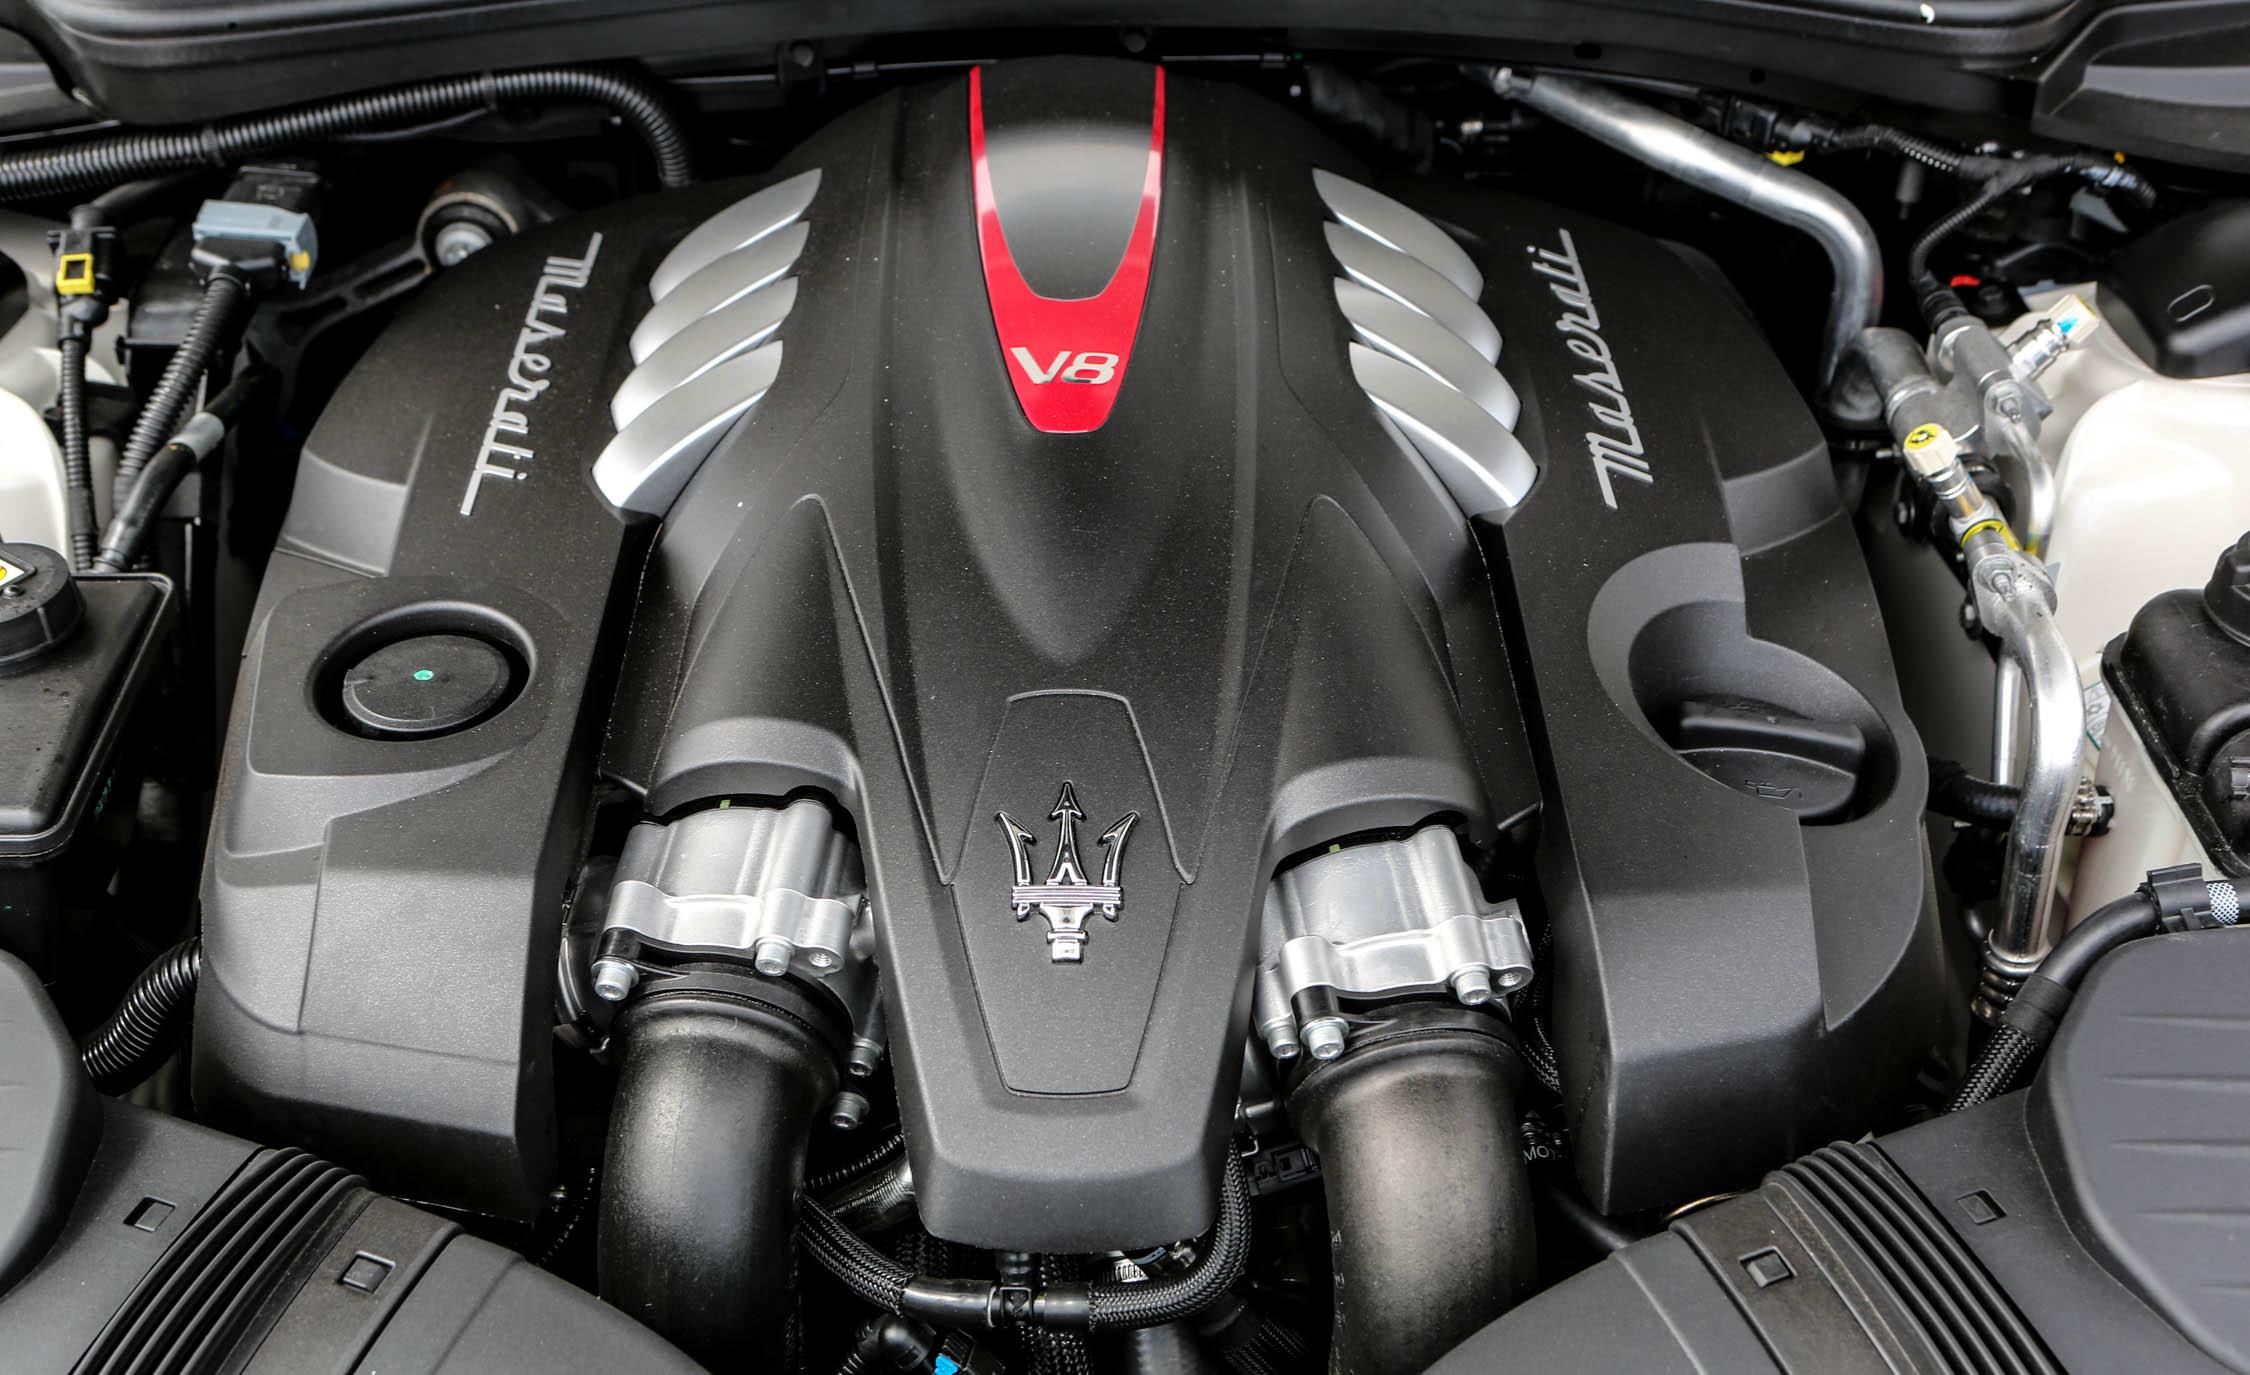 2017 Maserati Quattroporte GTS GranSport Twin Turbocharged 3.8 Liter V 8 Engine (Photo 32 of 55)